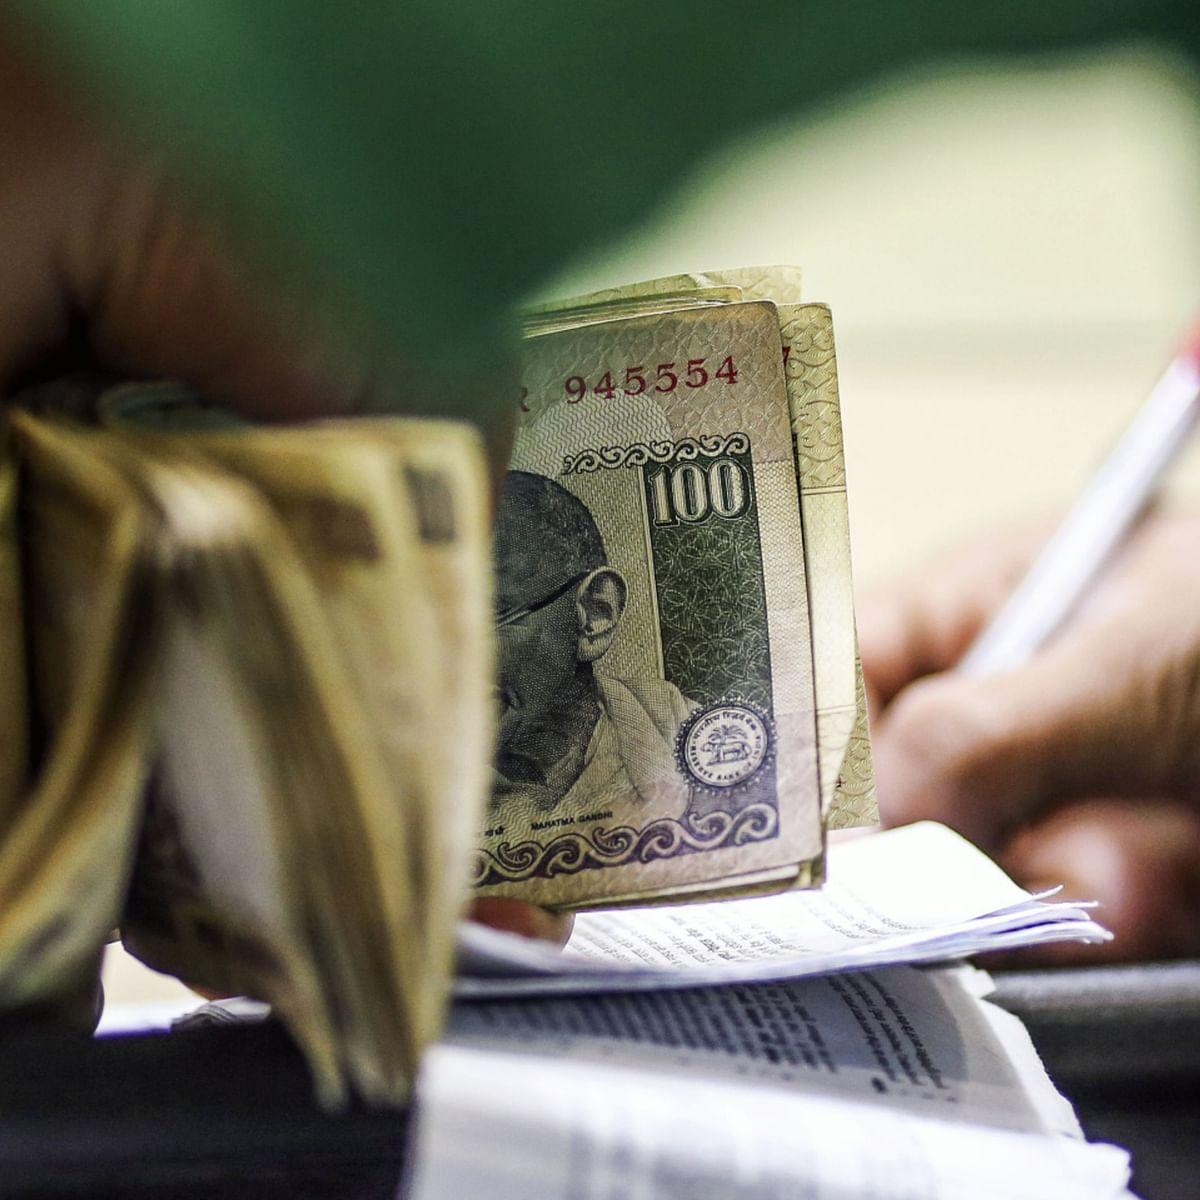 Non-Life Insurers' Revenue Dips Amid Second Covid-19 Wave